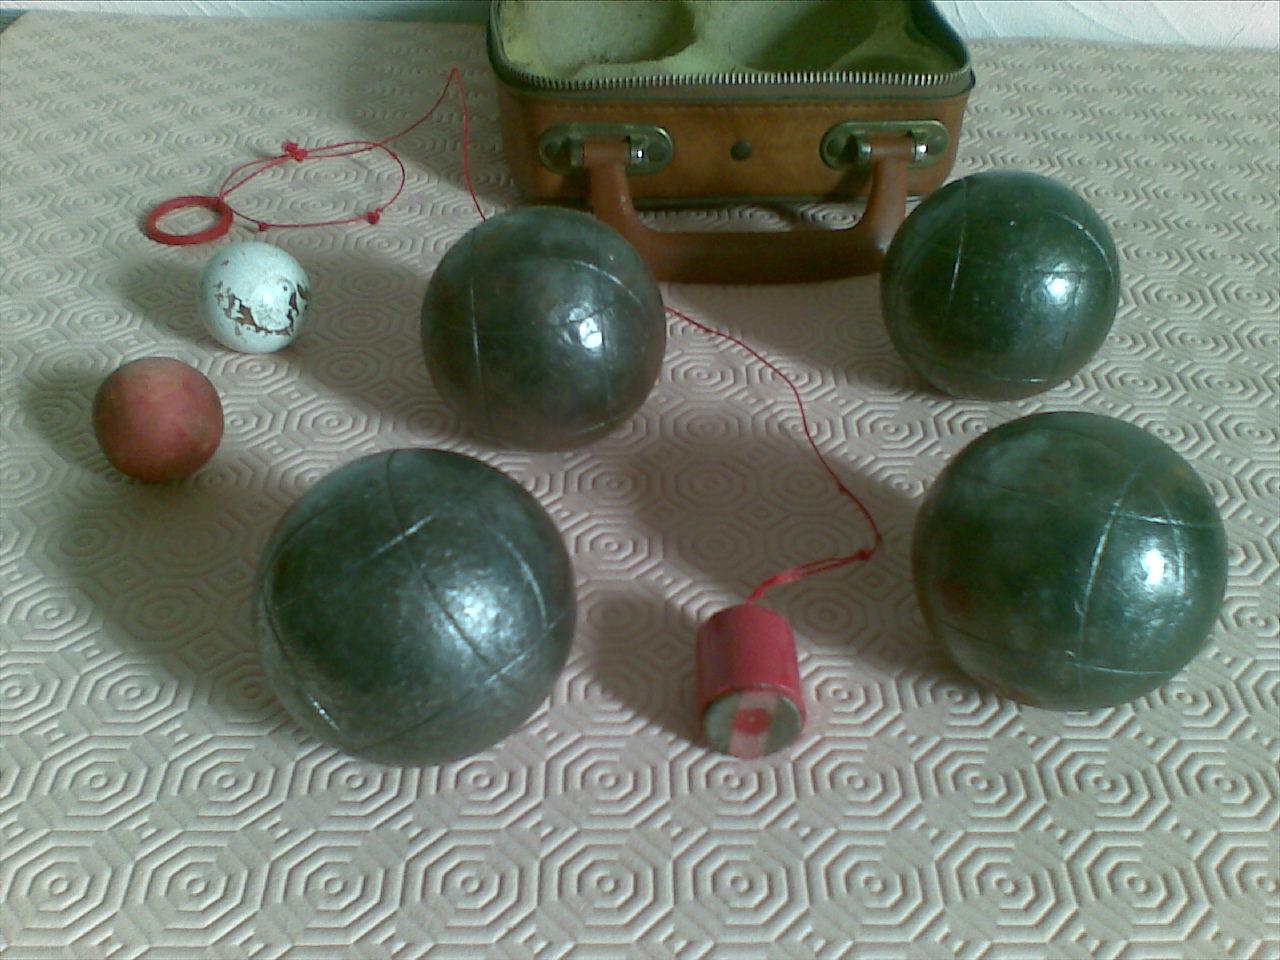 4 boules de petanque la m ridionale 1978 camping jeu ebay. Black Bedroom Furniture Sets. Home Design Ideas